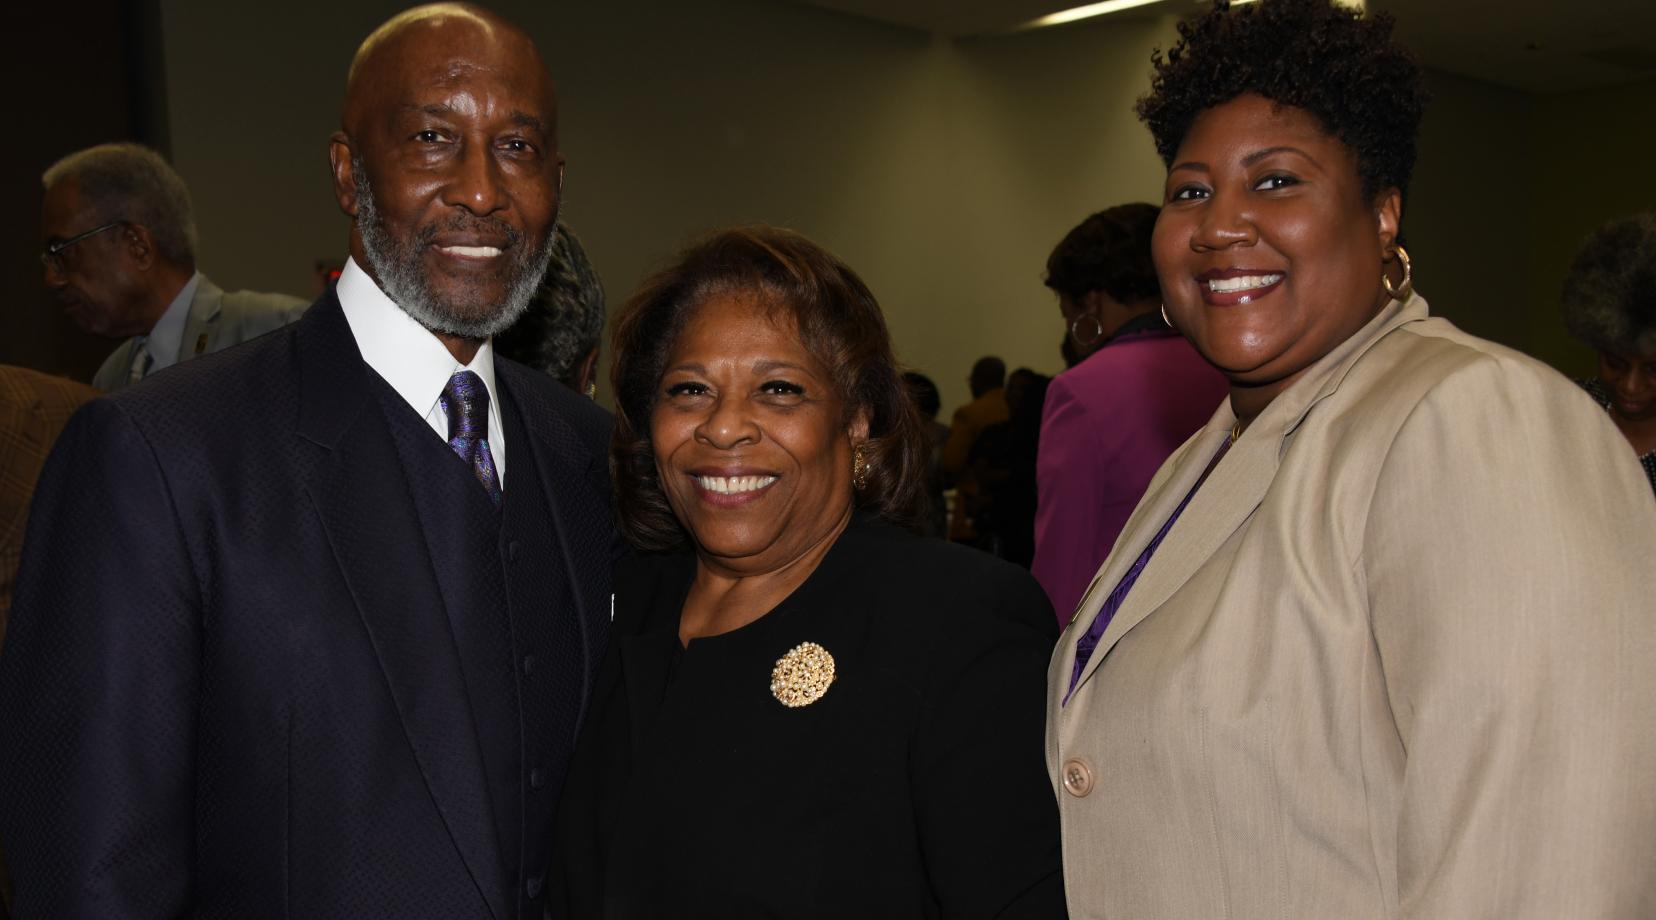 Bishop John R. Bryant, Prayer Breakfast keynote speaker, University President Wilma Mishoe, and Rev. Erika Crawford, Community Faith Partner Awardee.